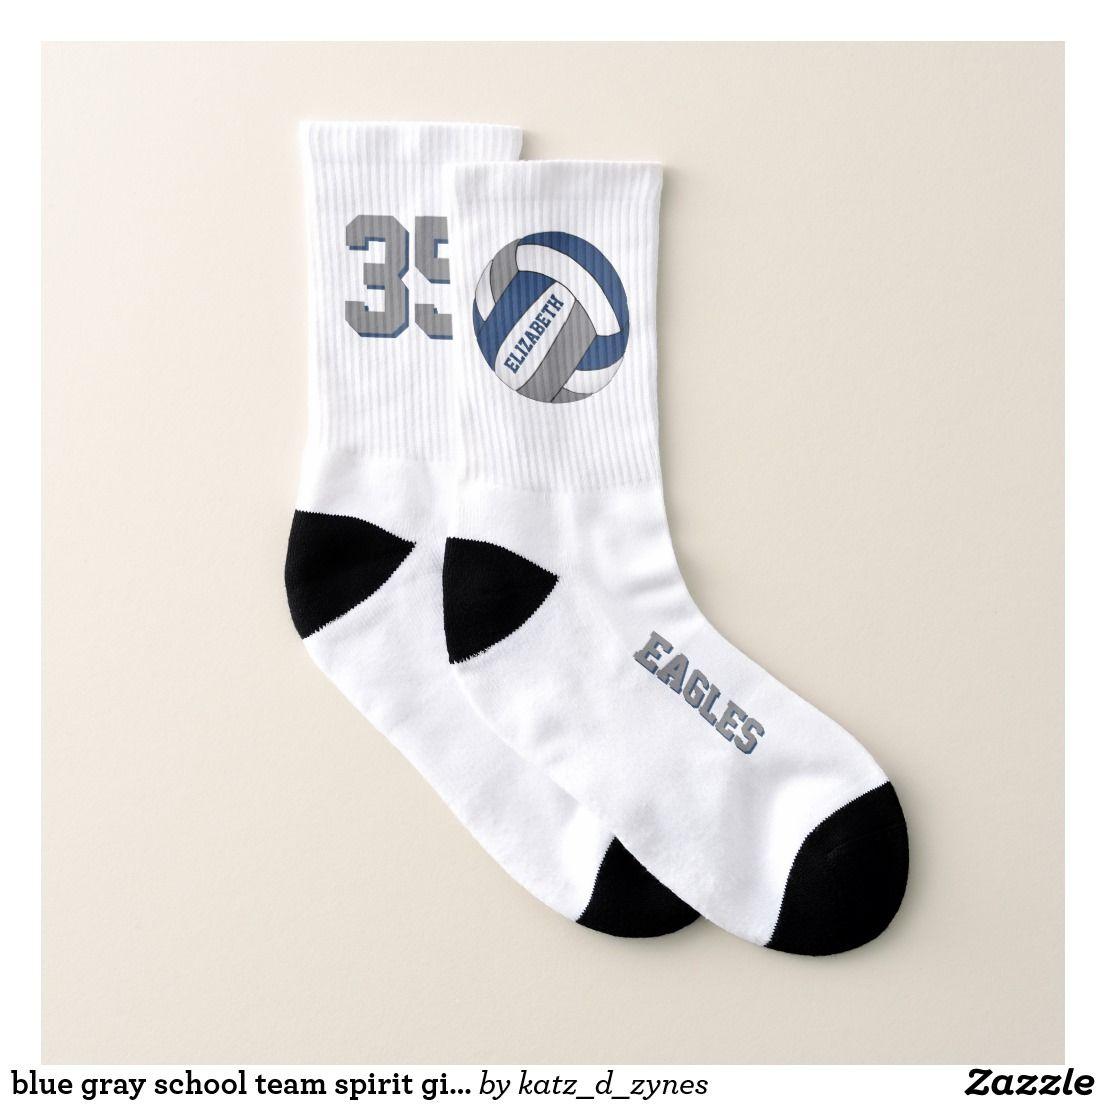 Blue Gray School Team Spirit Girls Volleyball Socks Zazzle Com In 2020 Yellow Team Volleyball Socks Team Colors